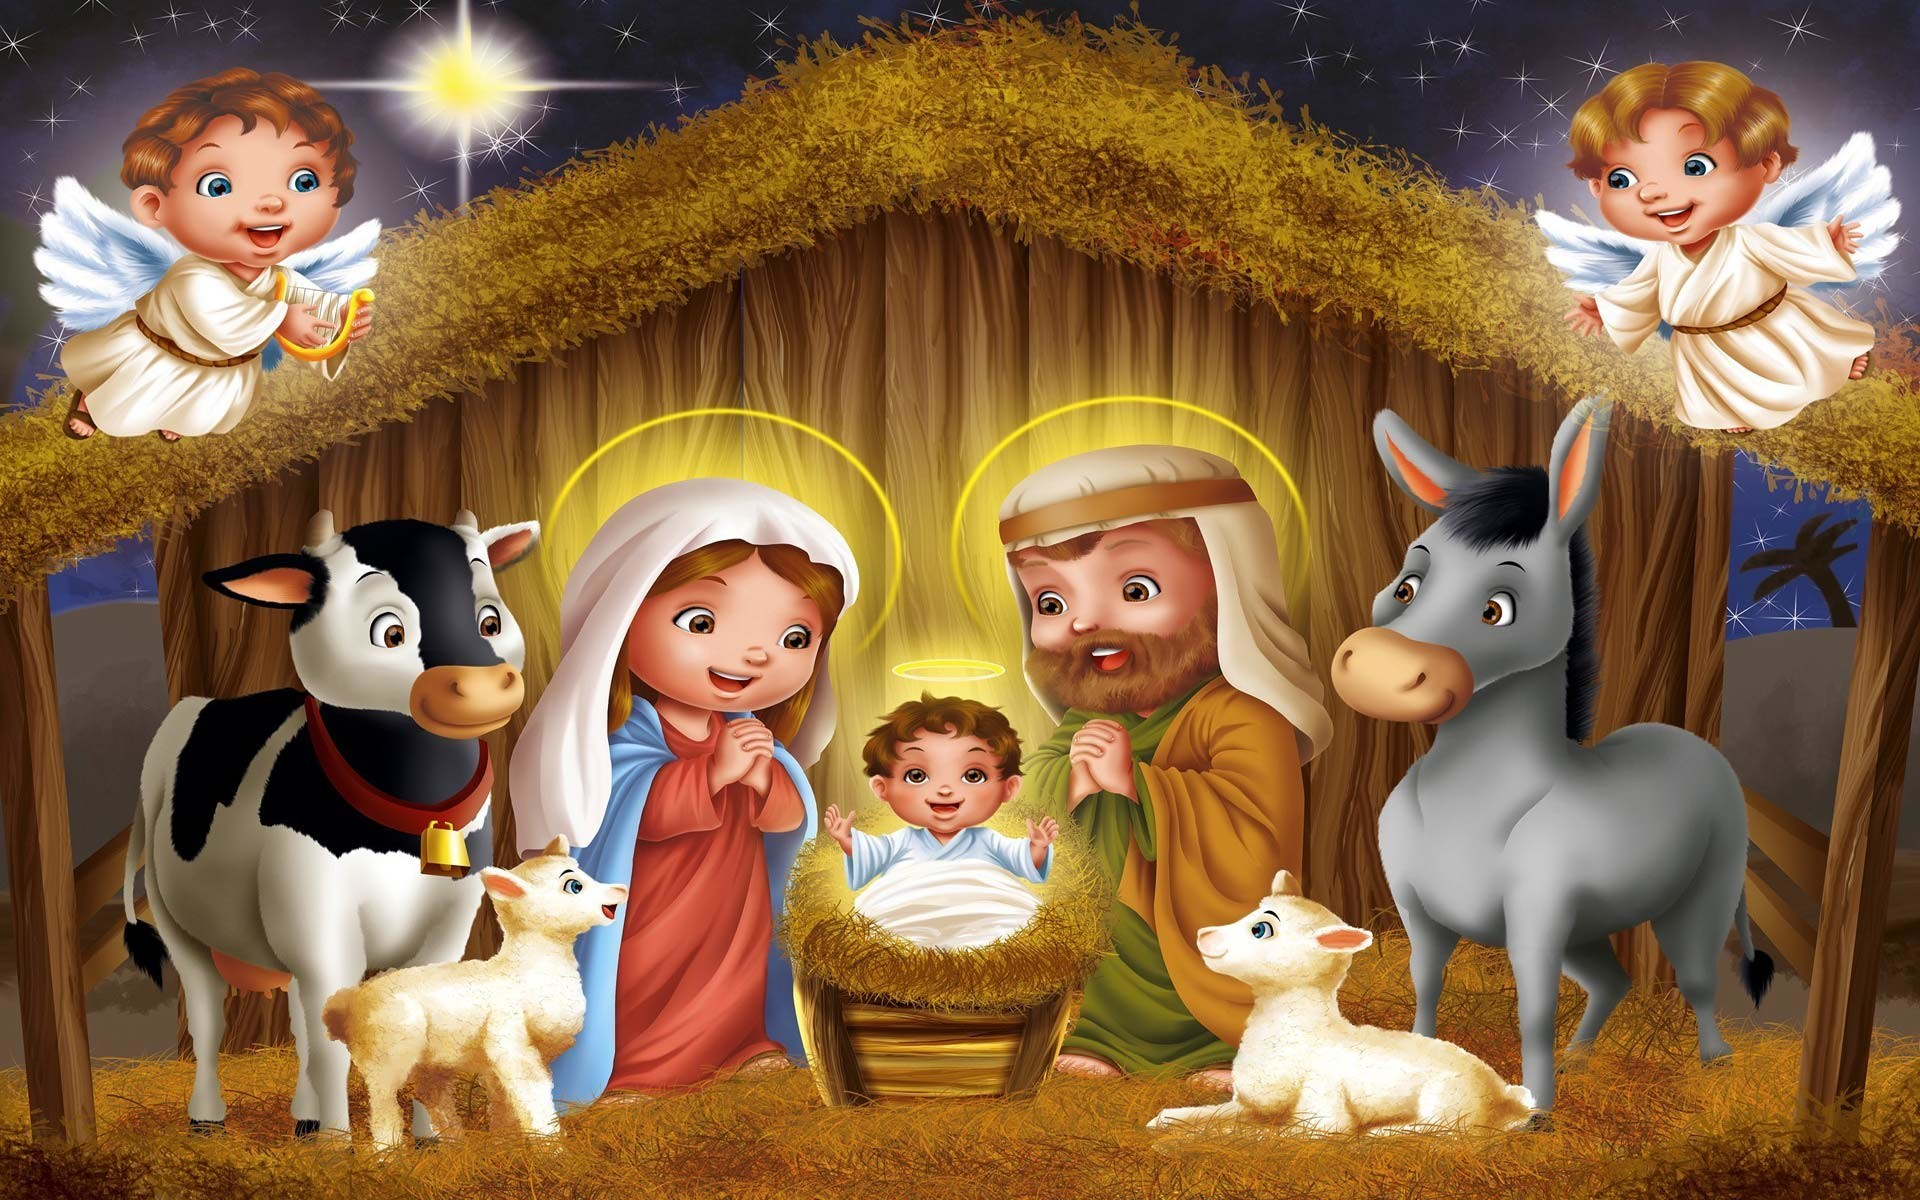 Xmas Stuff For > Christmas Wallpaper Nativity